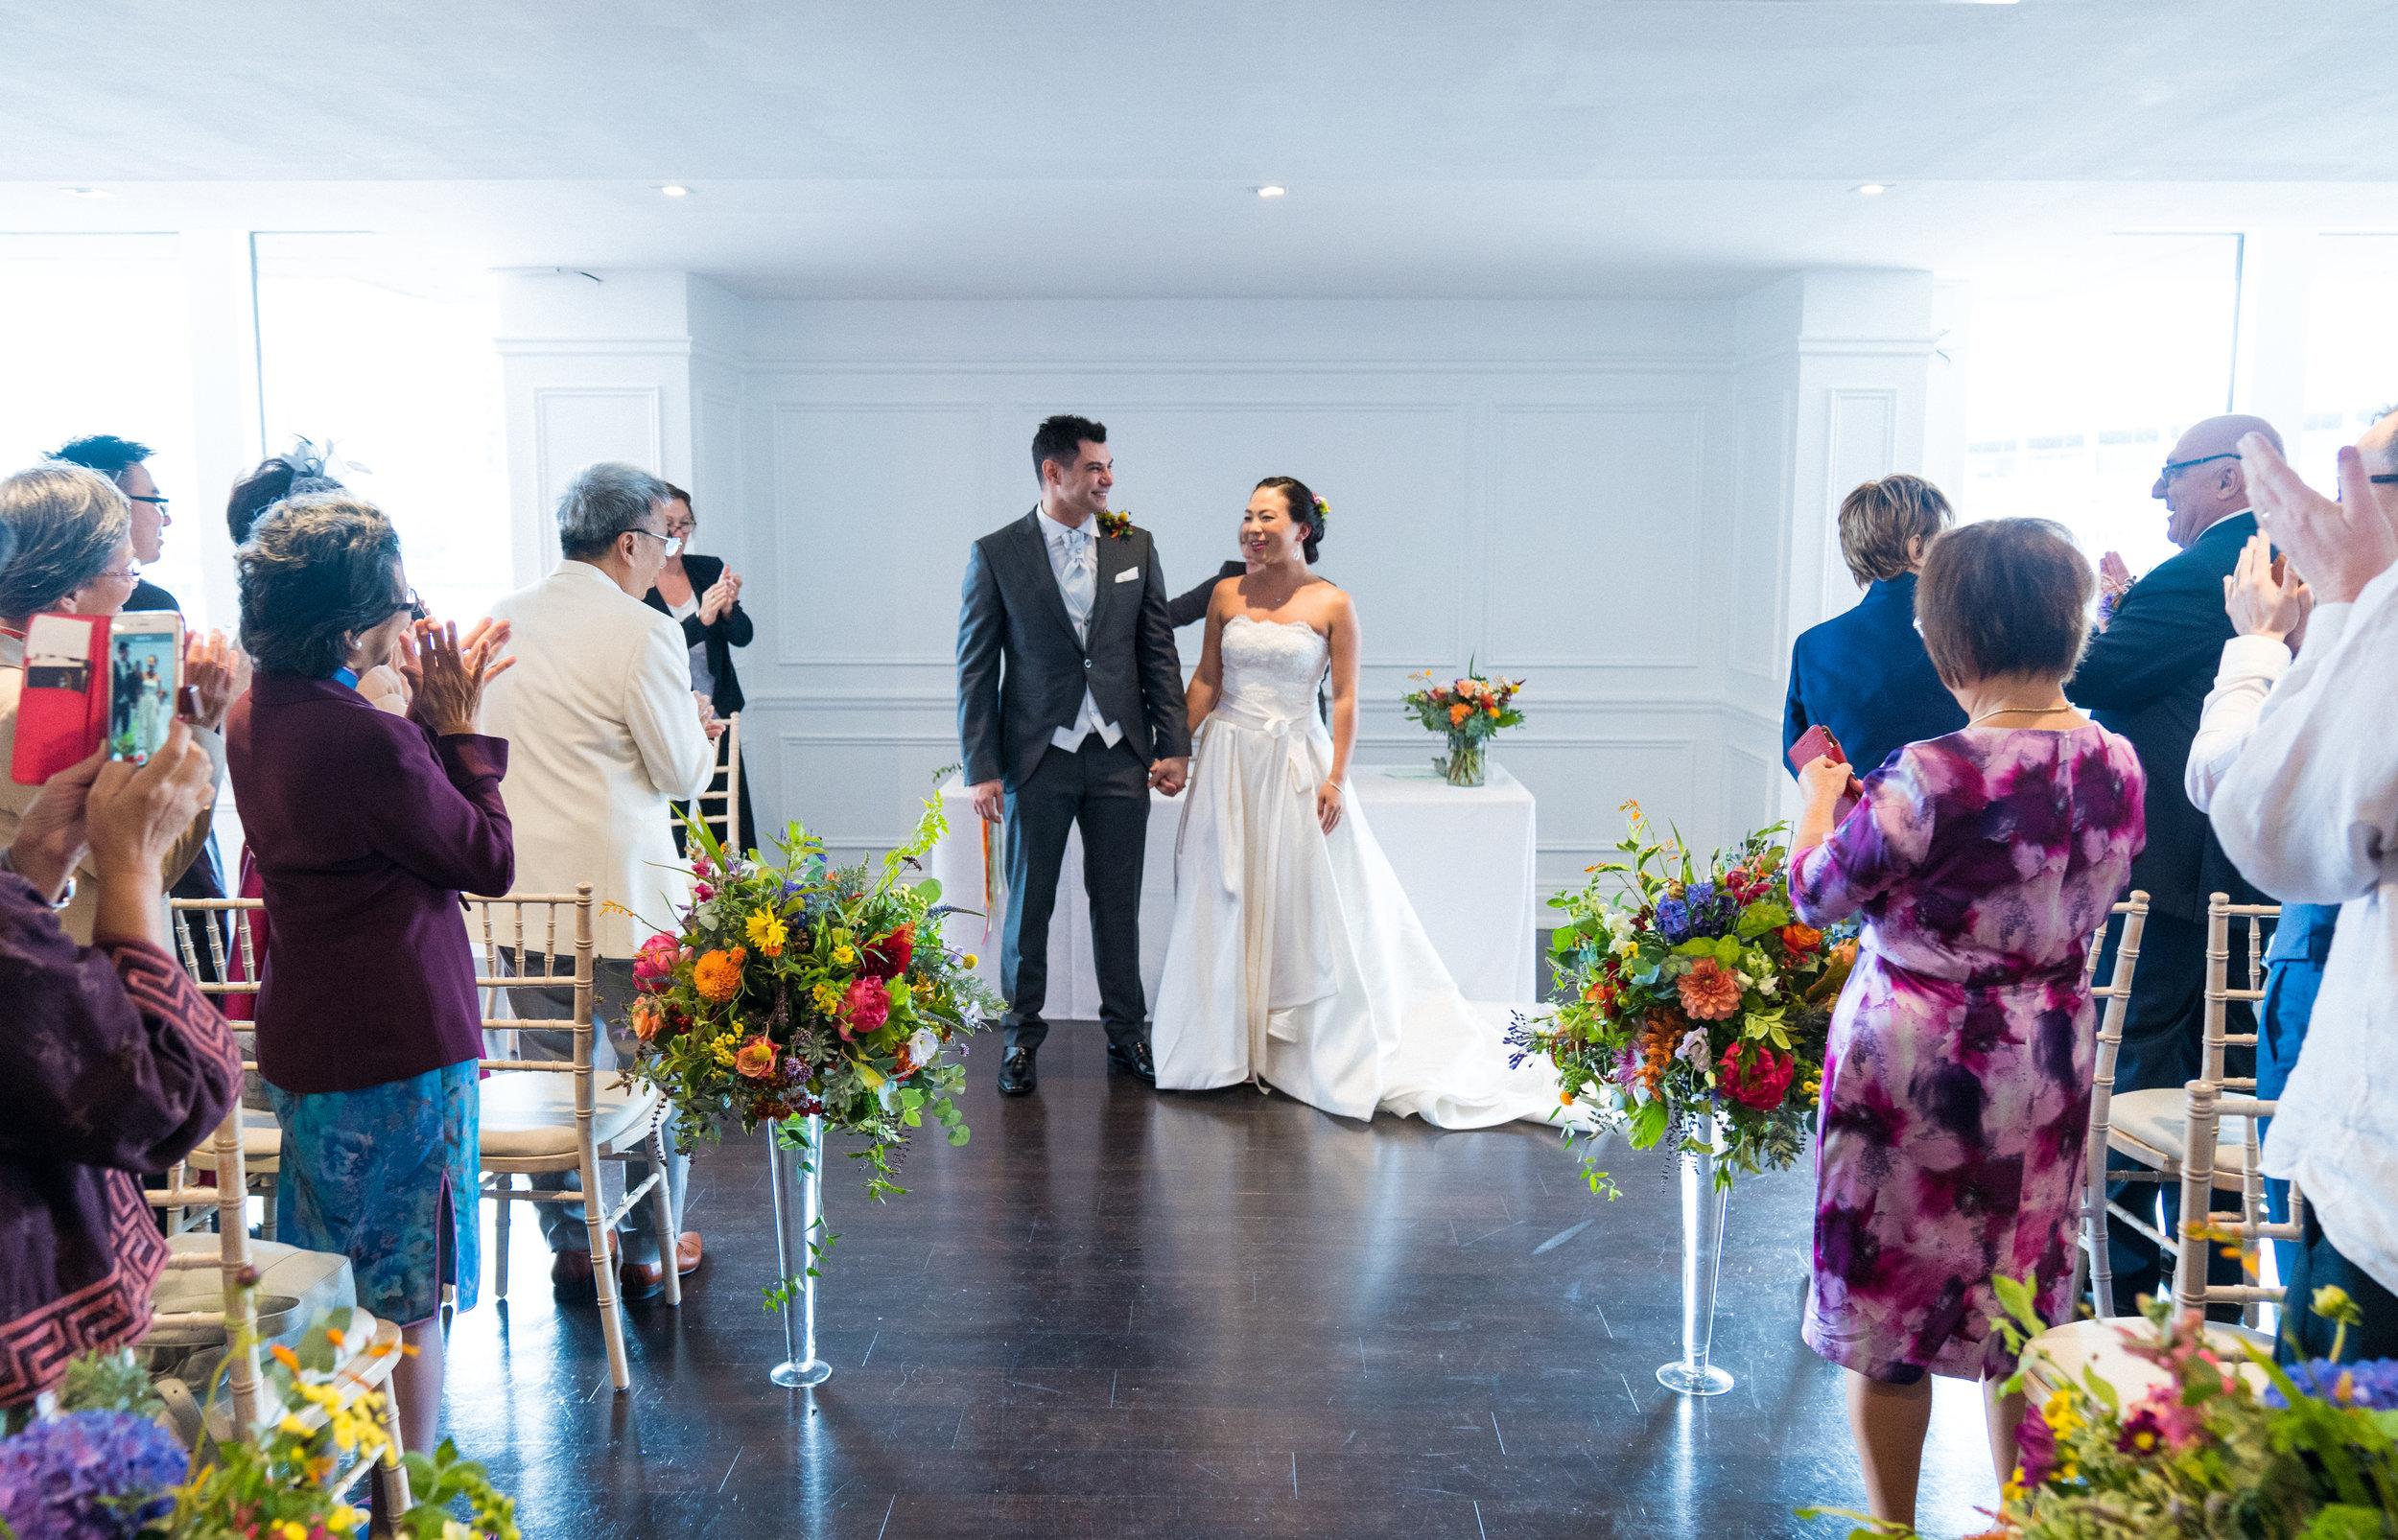 river-rooms-blackfriars-london-stpauls-mondrian-hotel-wedding-photography-videography-40